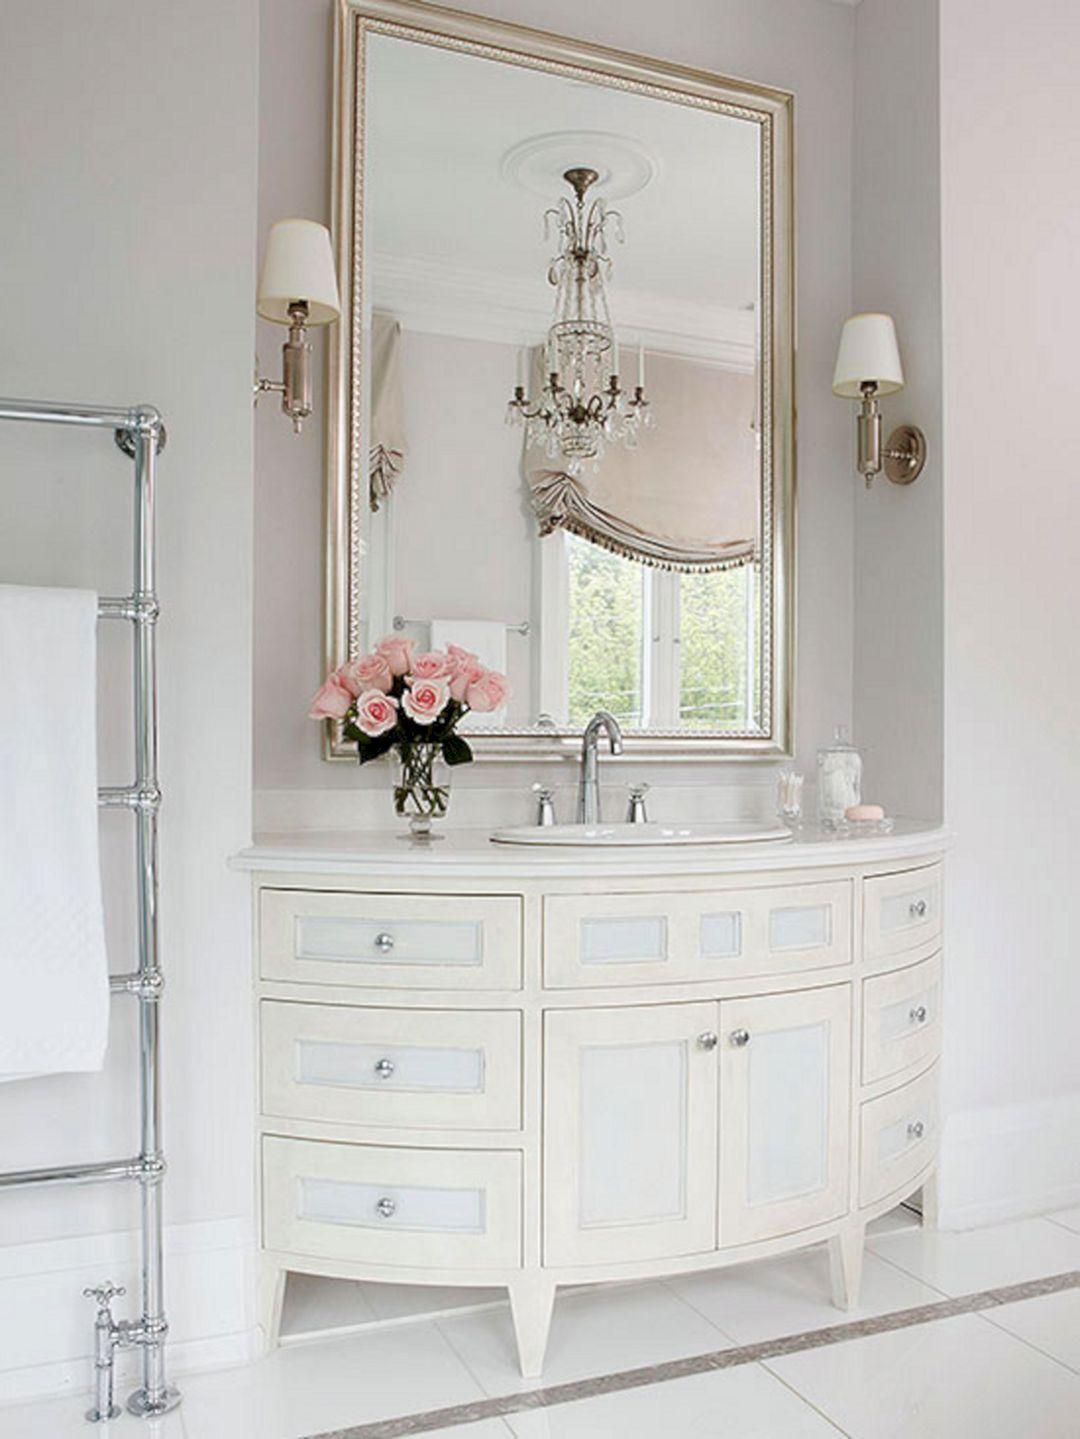 Elegant White Bathroom Vanity Ideas: 55+Most Beautiful Inspirations ...